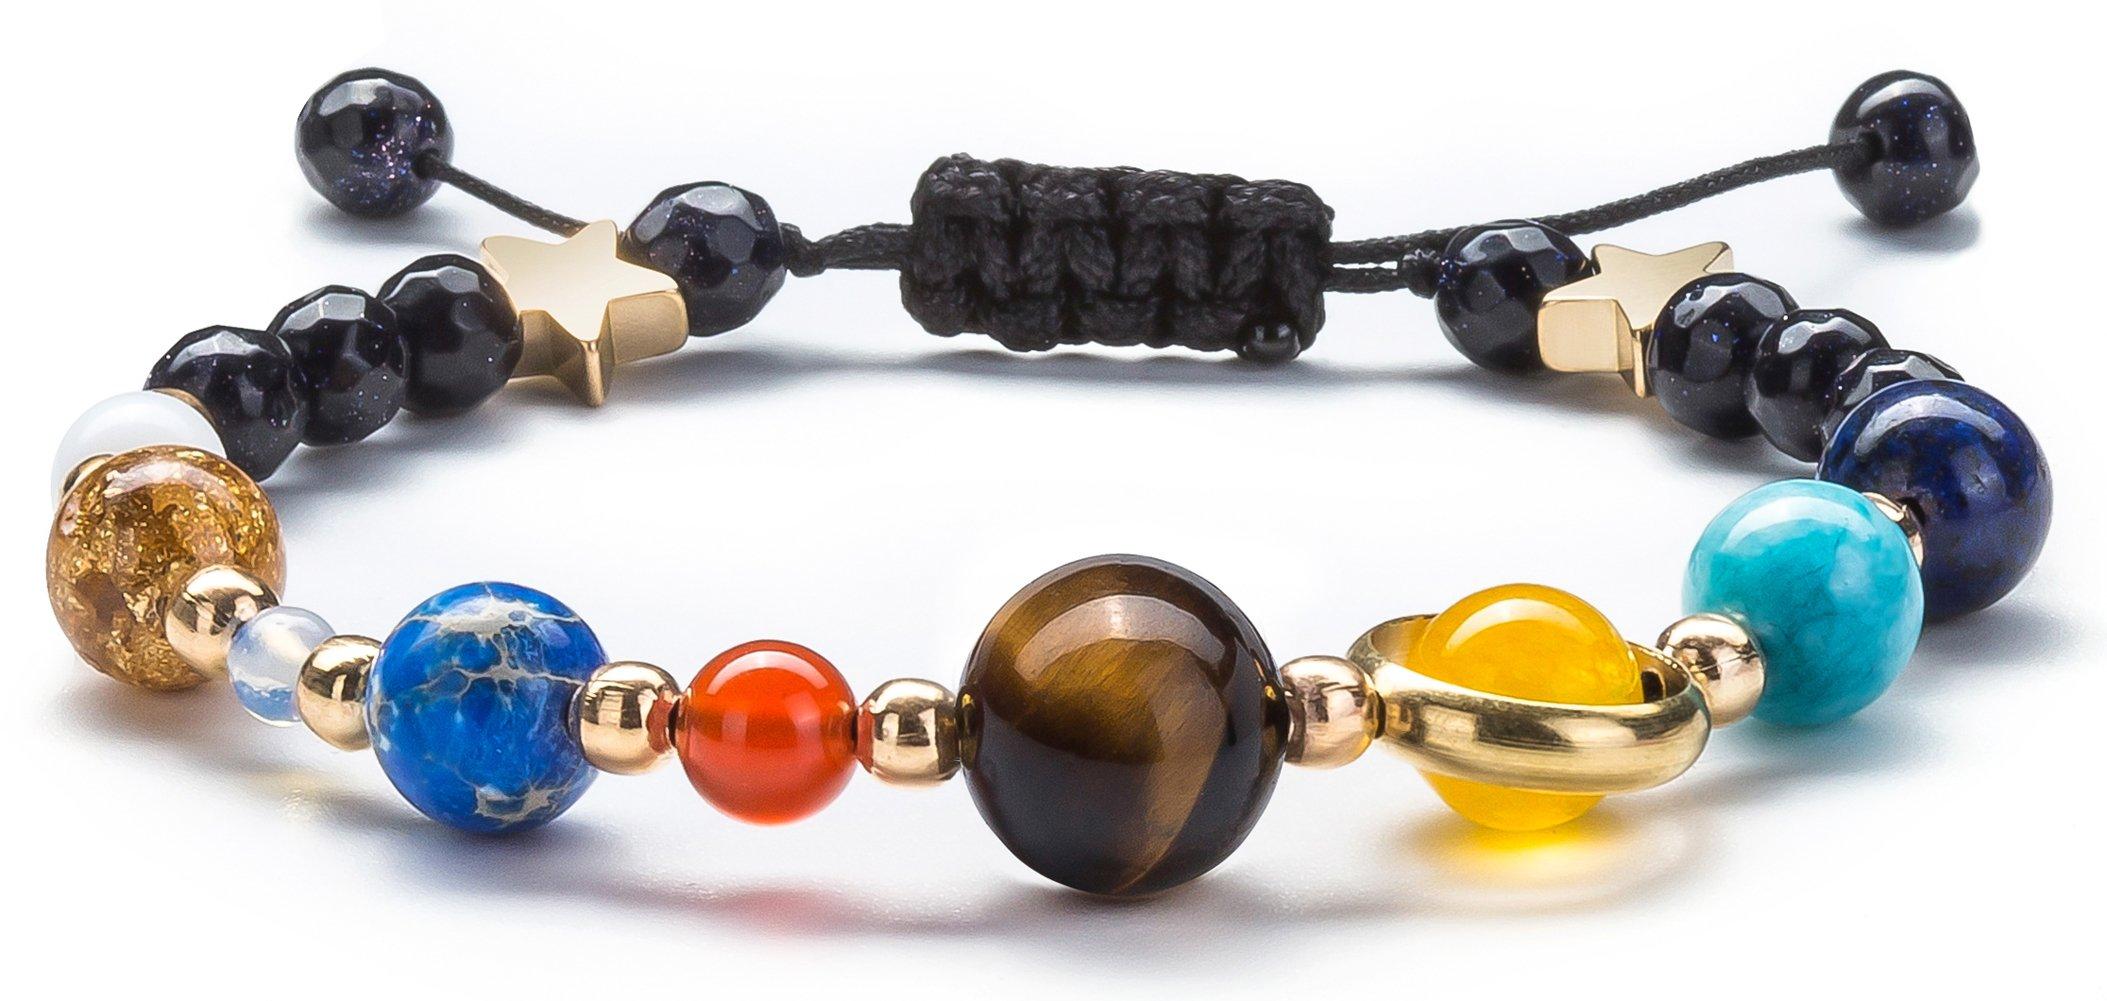 Fesciory Women Men Solar System Bracelet Universe Galaxy The Eight Planets Guardian Star Natural Stone Beads Bracelet Bangle(Blue Sandstone(Adjustable))